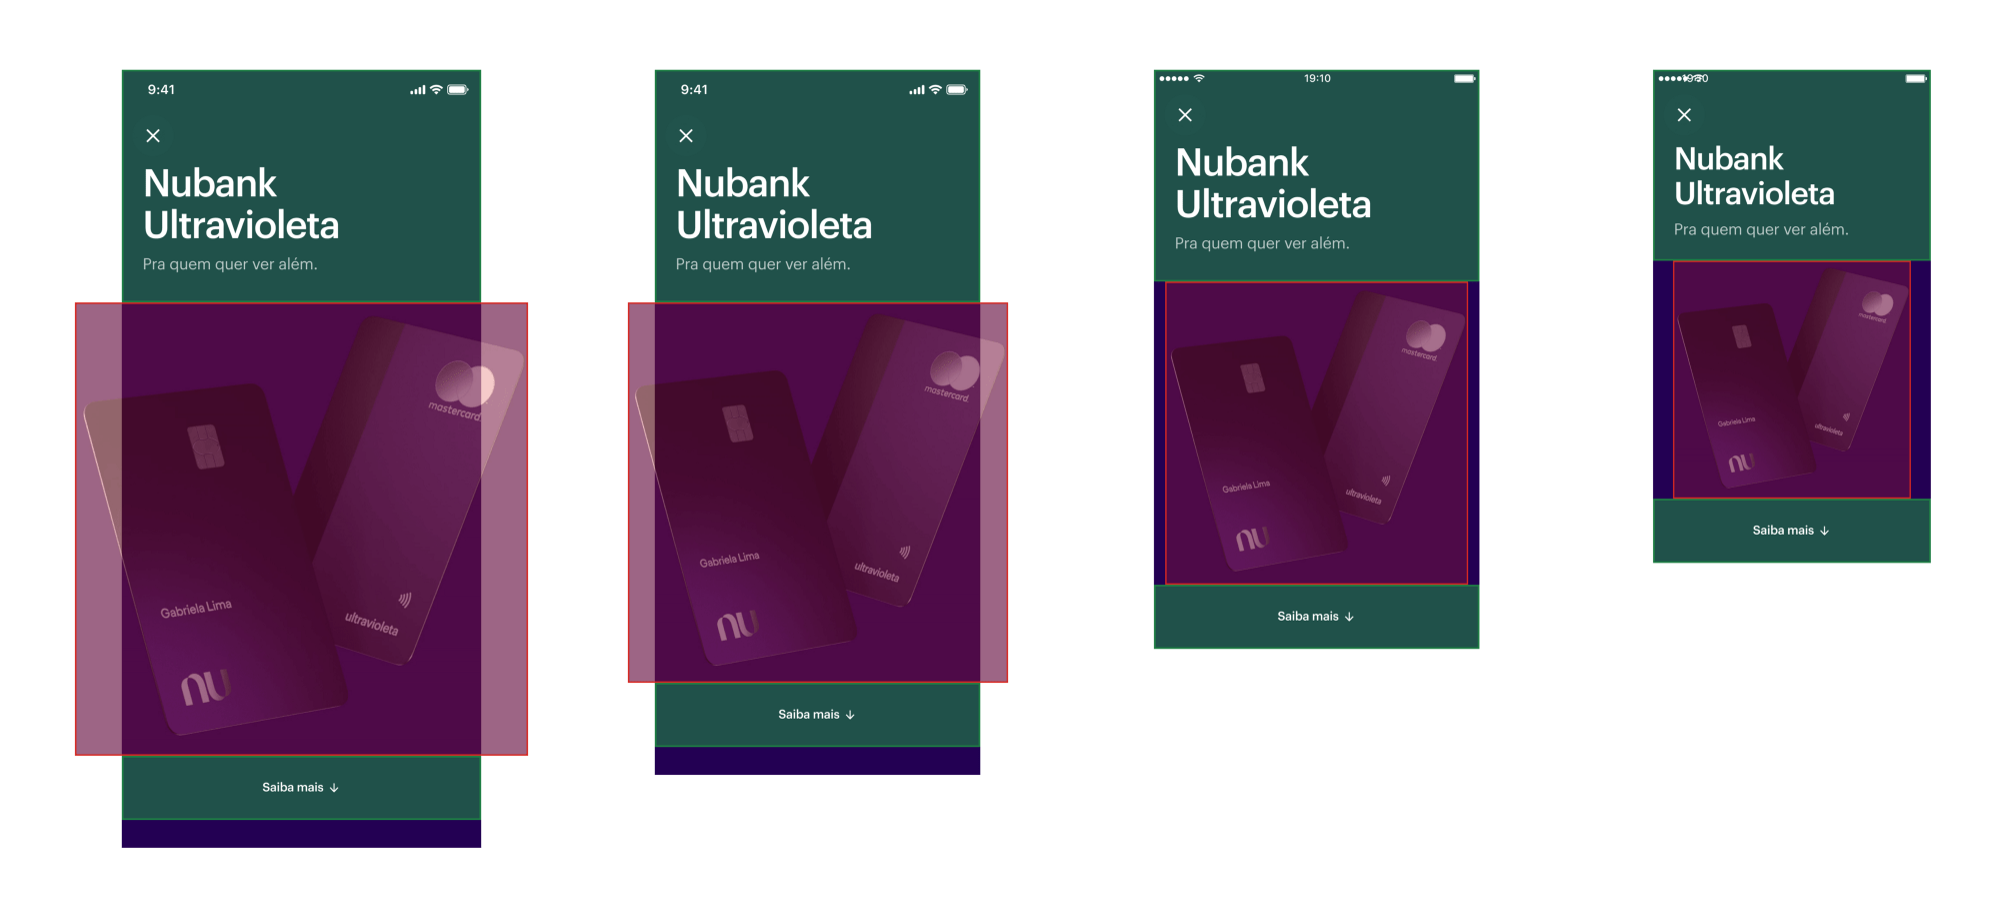 Ultravioleta: design for different screen sizes.